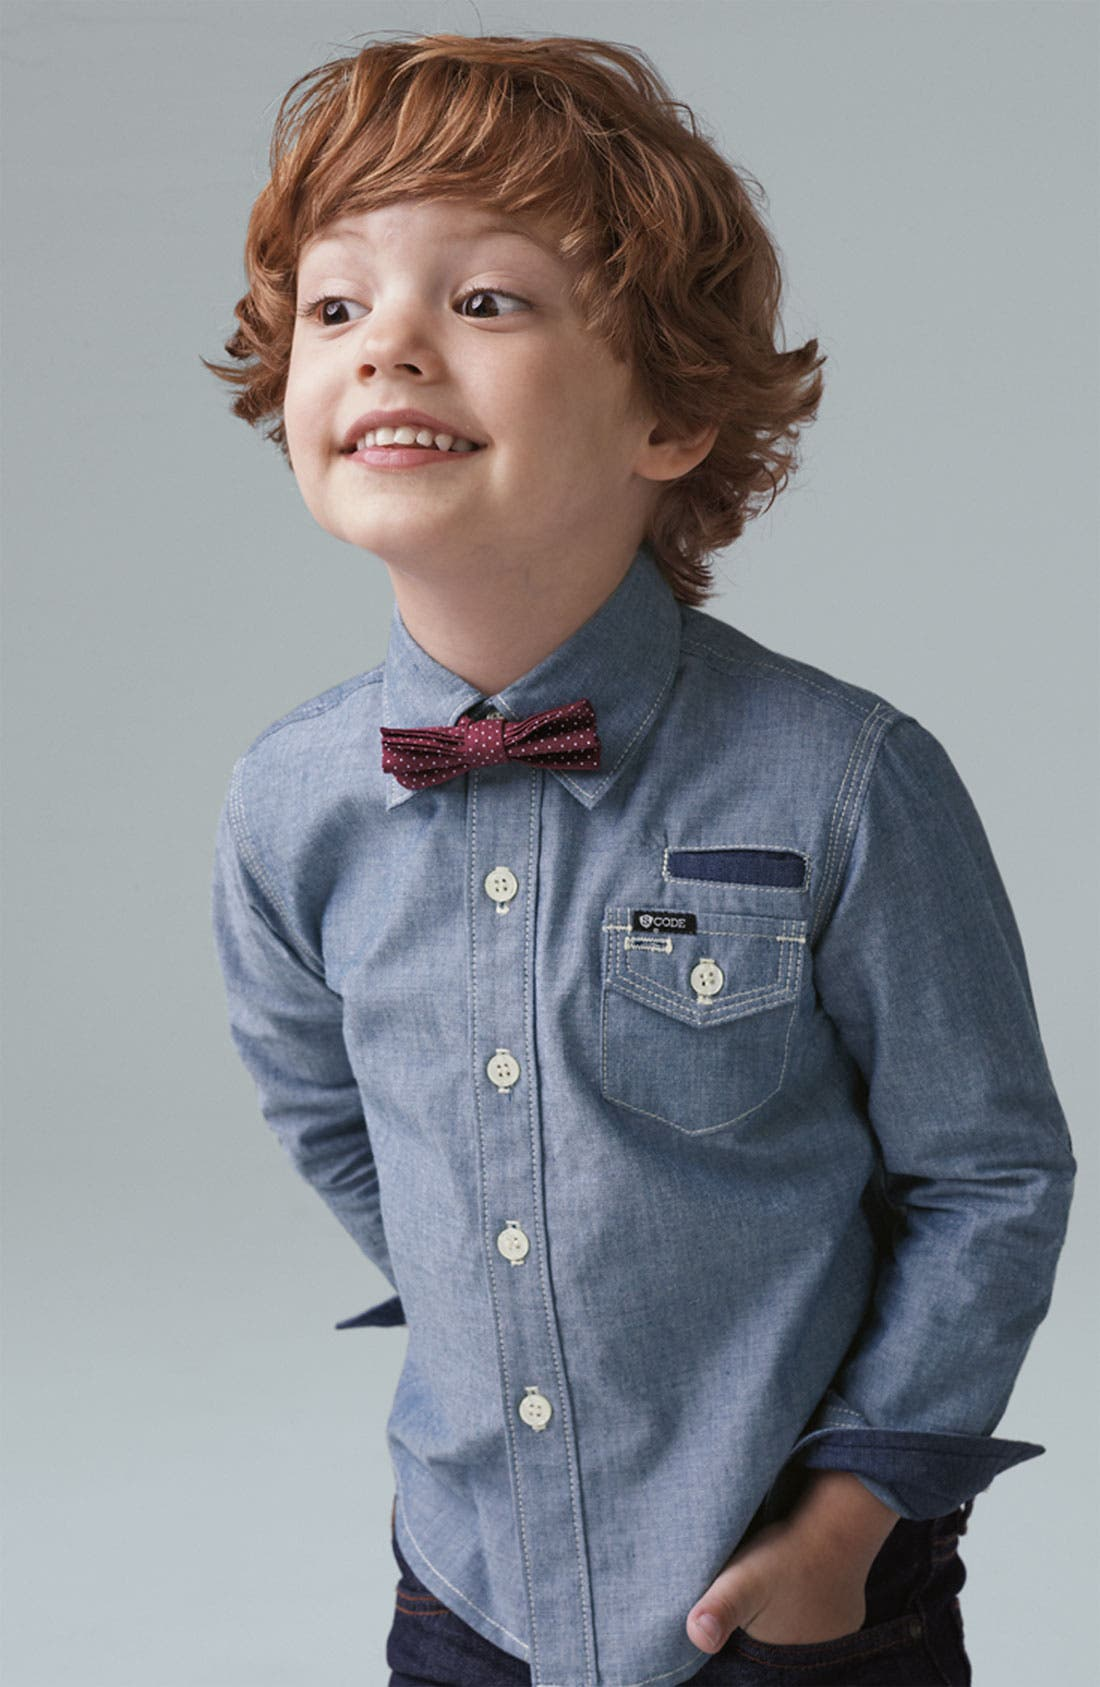 Alternate Image 1 Selected - Sovereign Code Shirt & Joe's Jeans (Toddler)